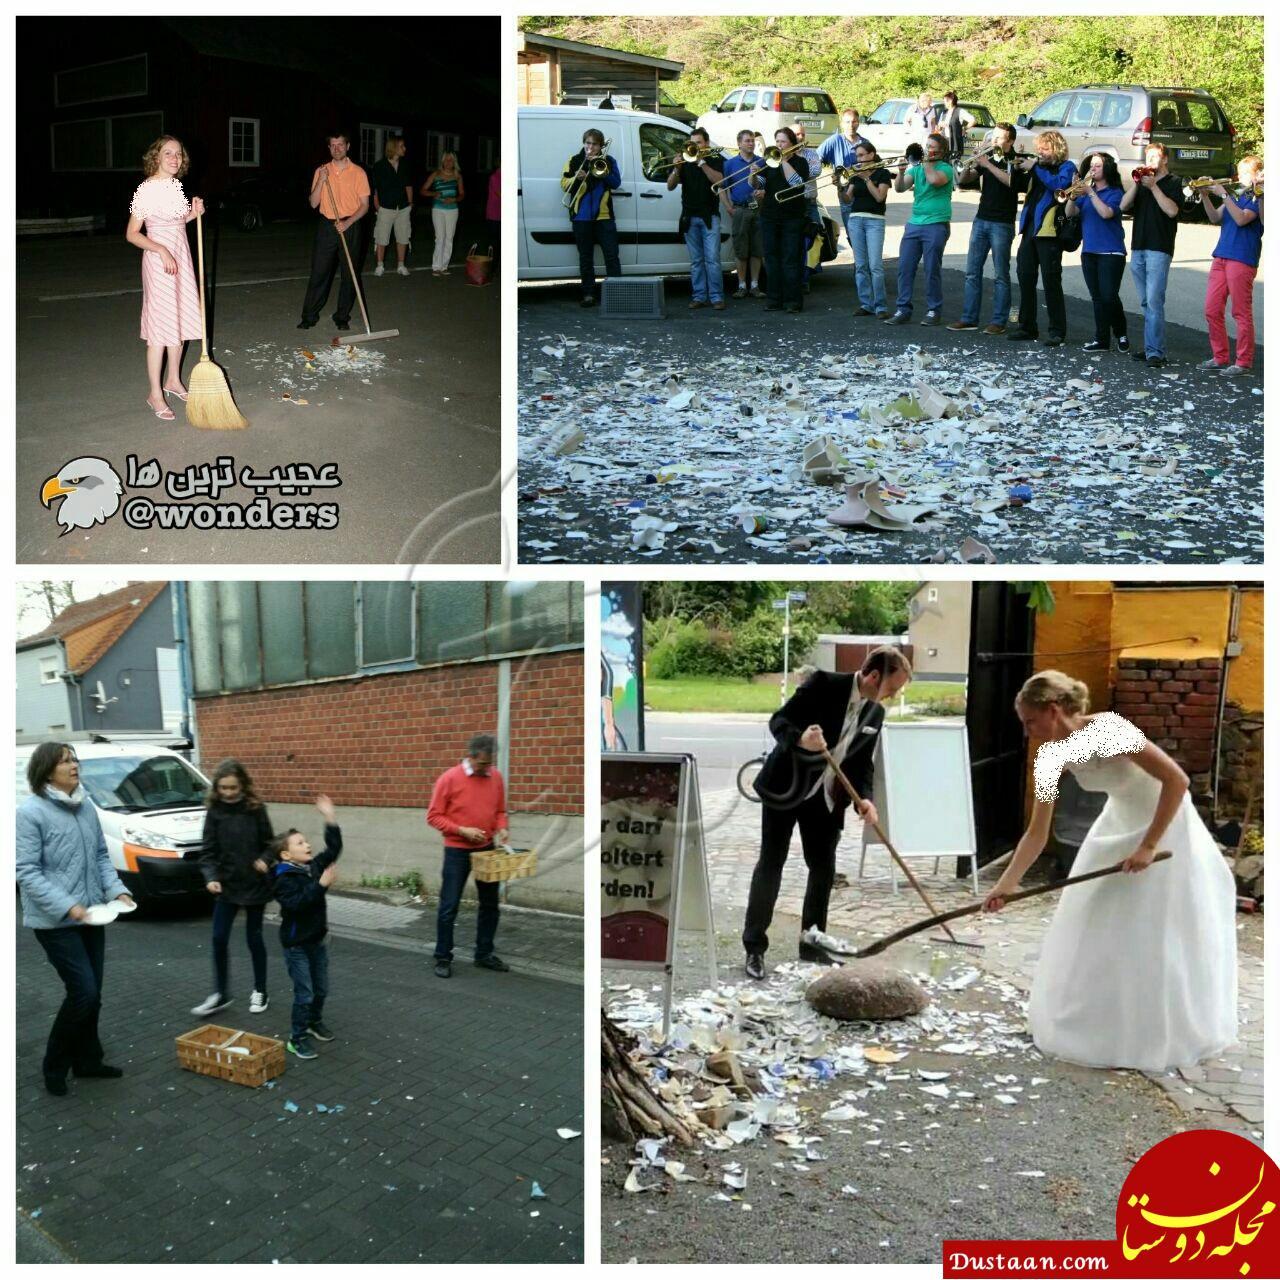 www.dustaan.com رسم عجیب در آلمان برای تازه عروس ها! +عکس